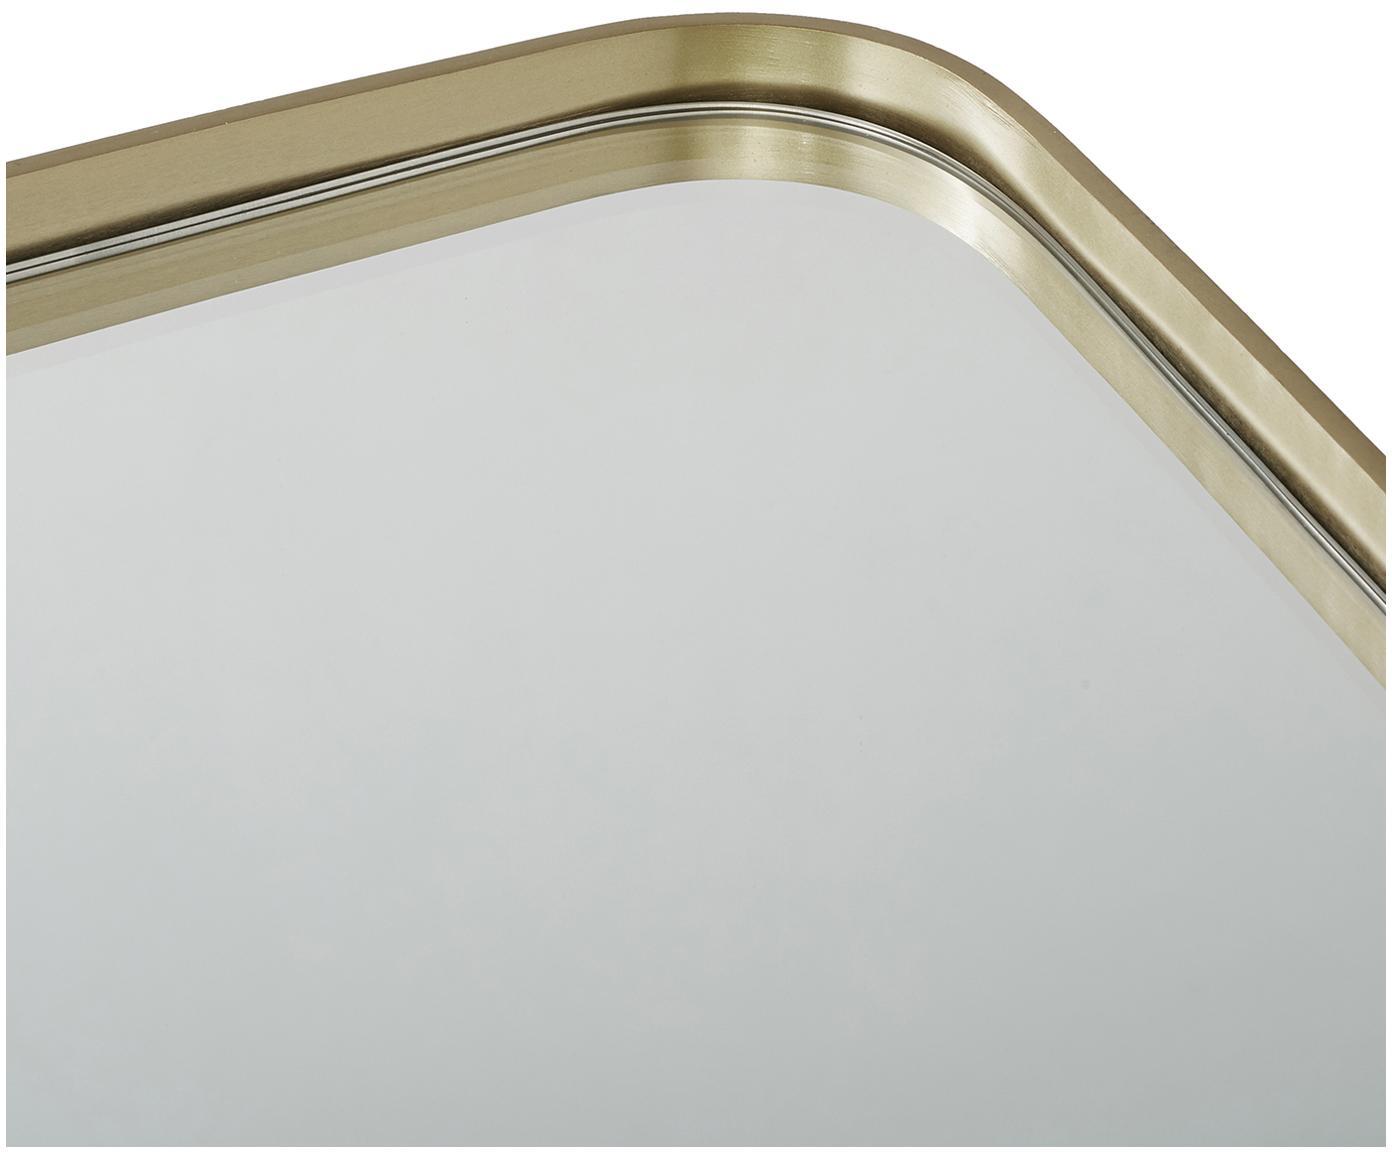 Wandspiegel Alyson, Frame: vermessingd metaal, Messingkleurig, 56 x 168 cm